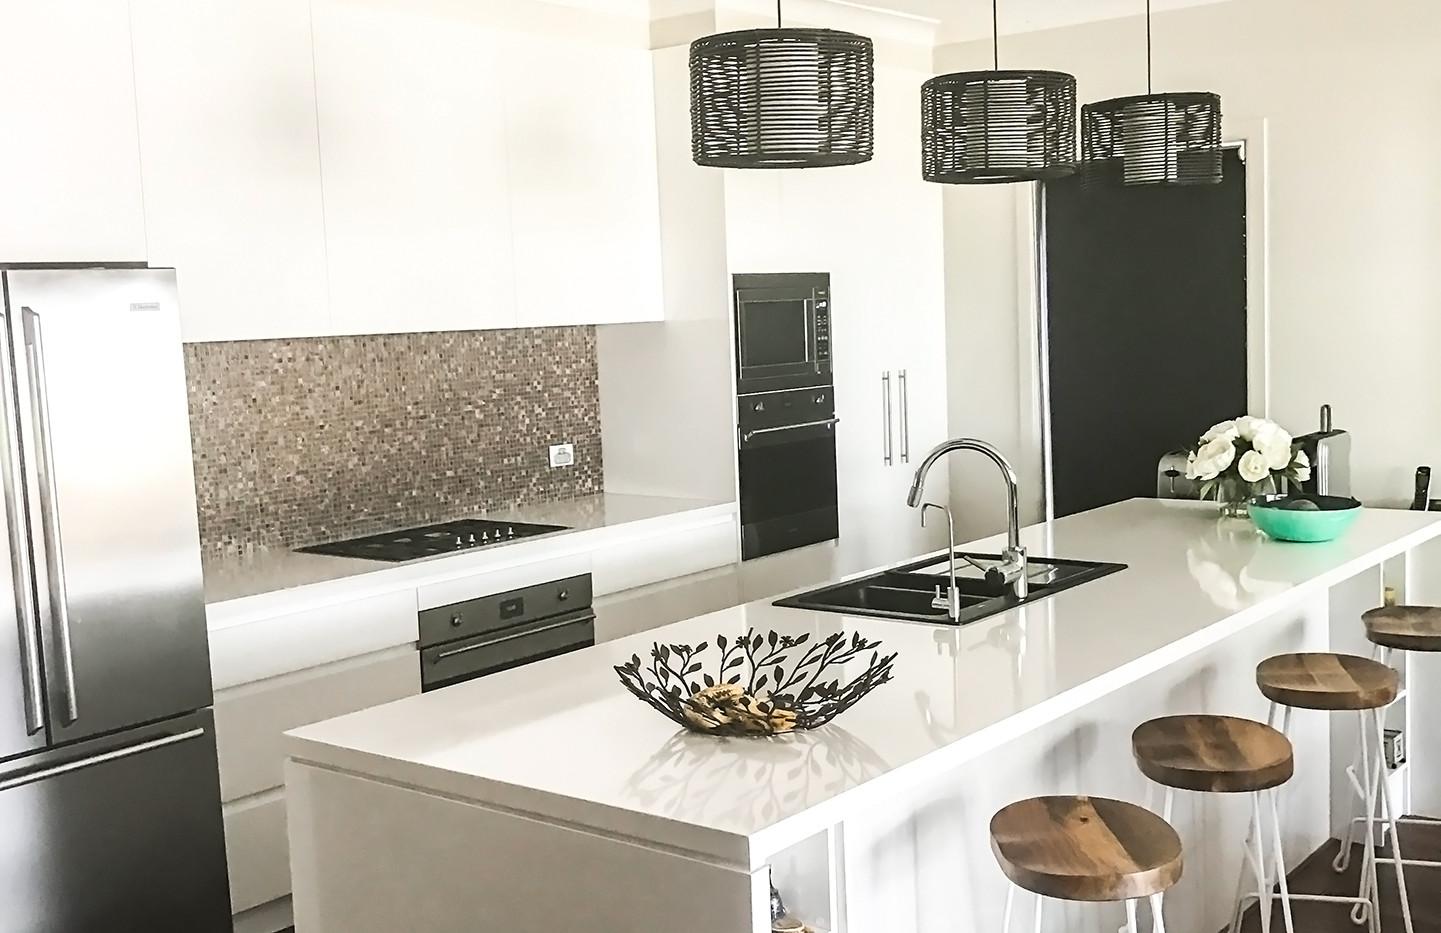 Contempoeary kitchen